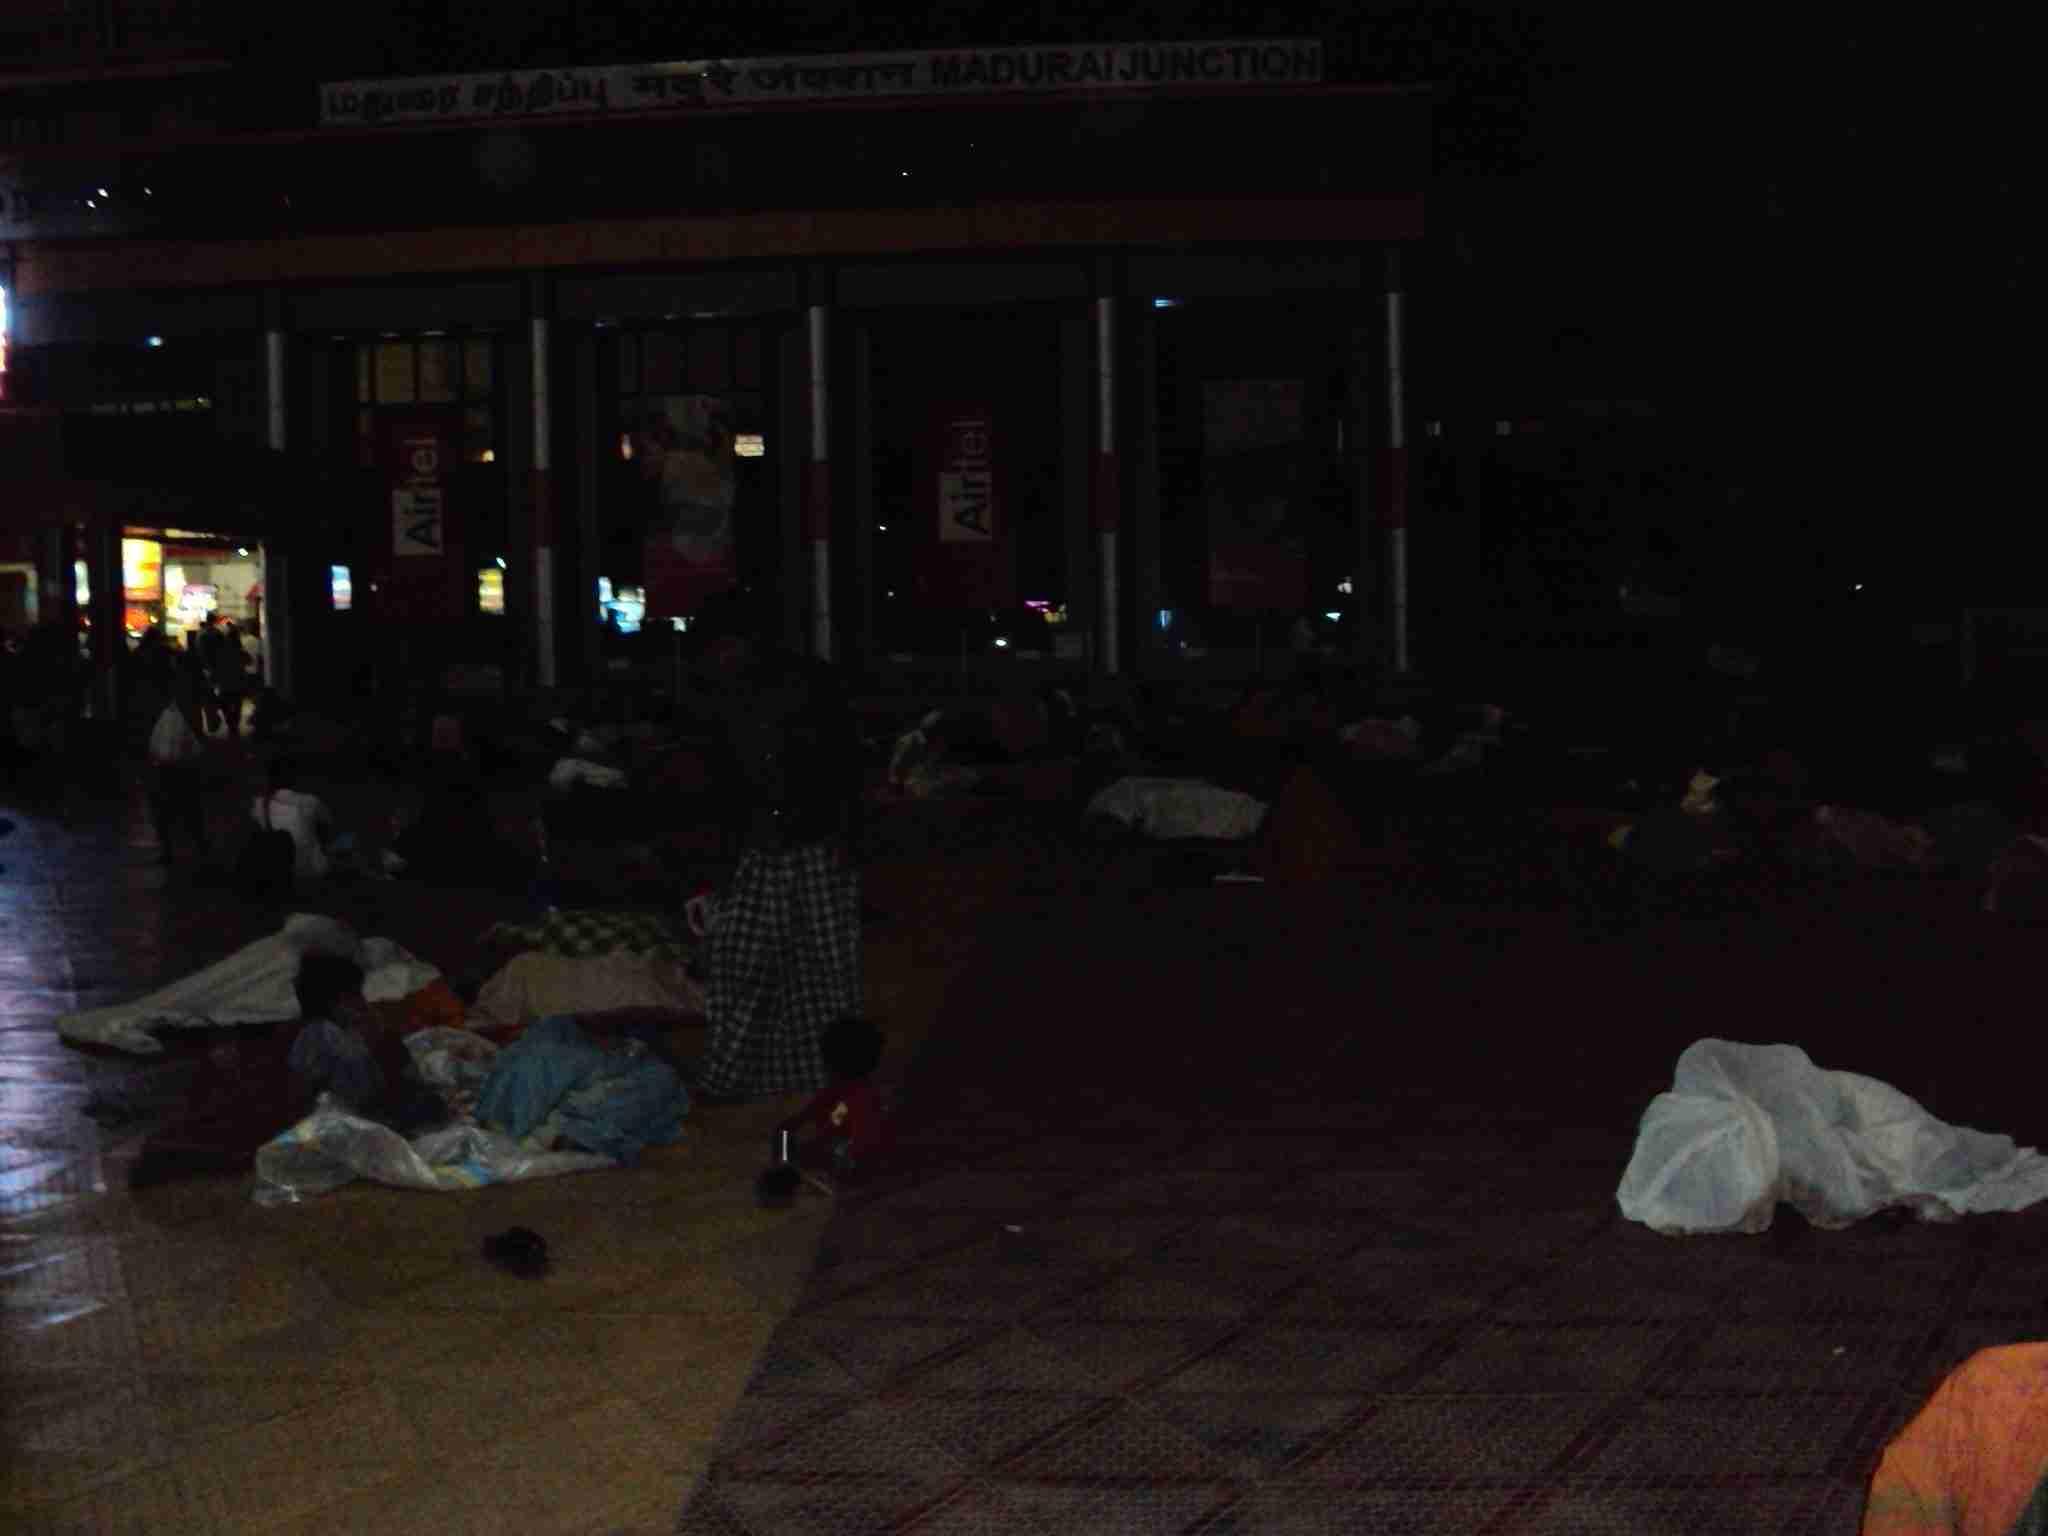 Night camp at train station